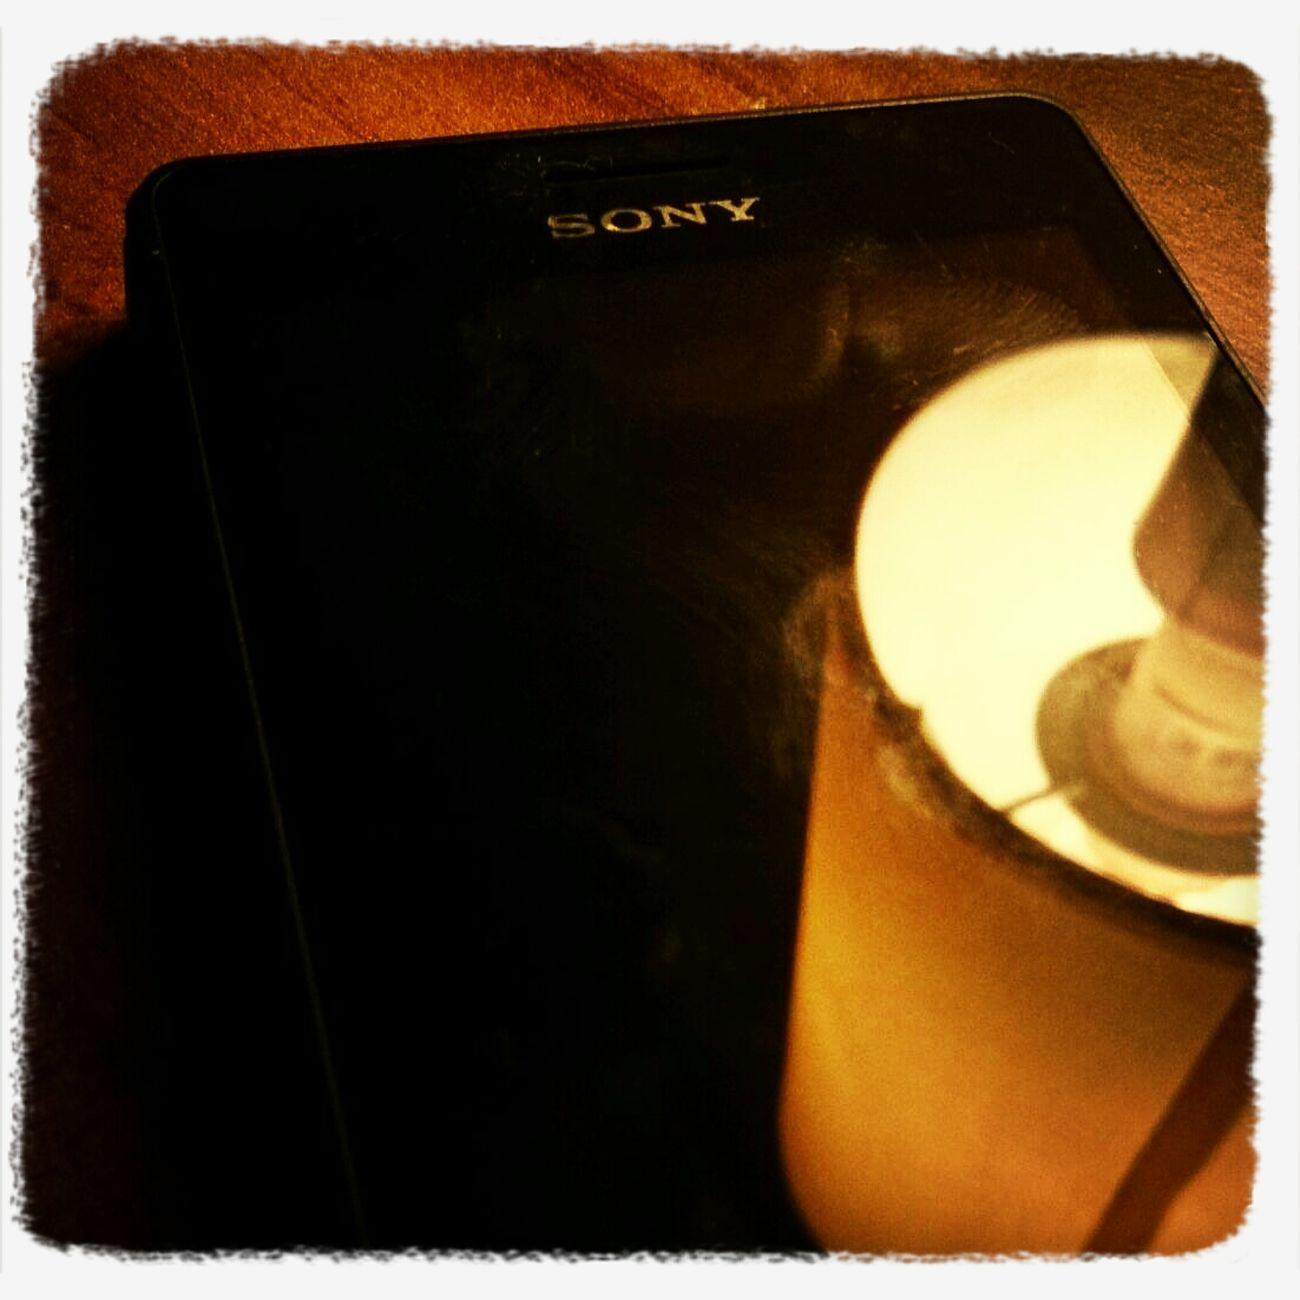 Sony Xperia Sony